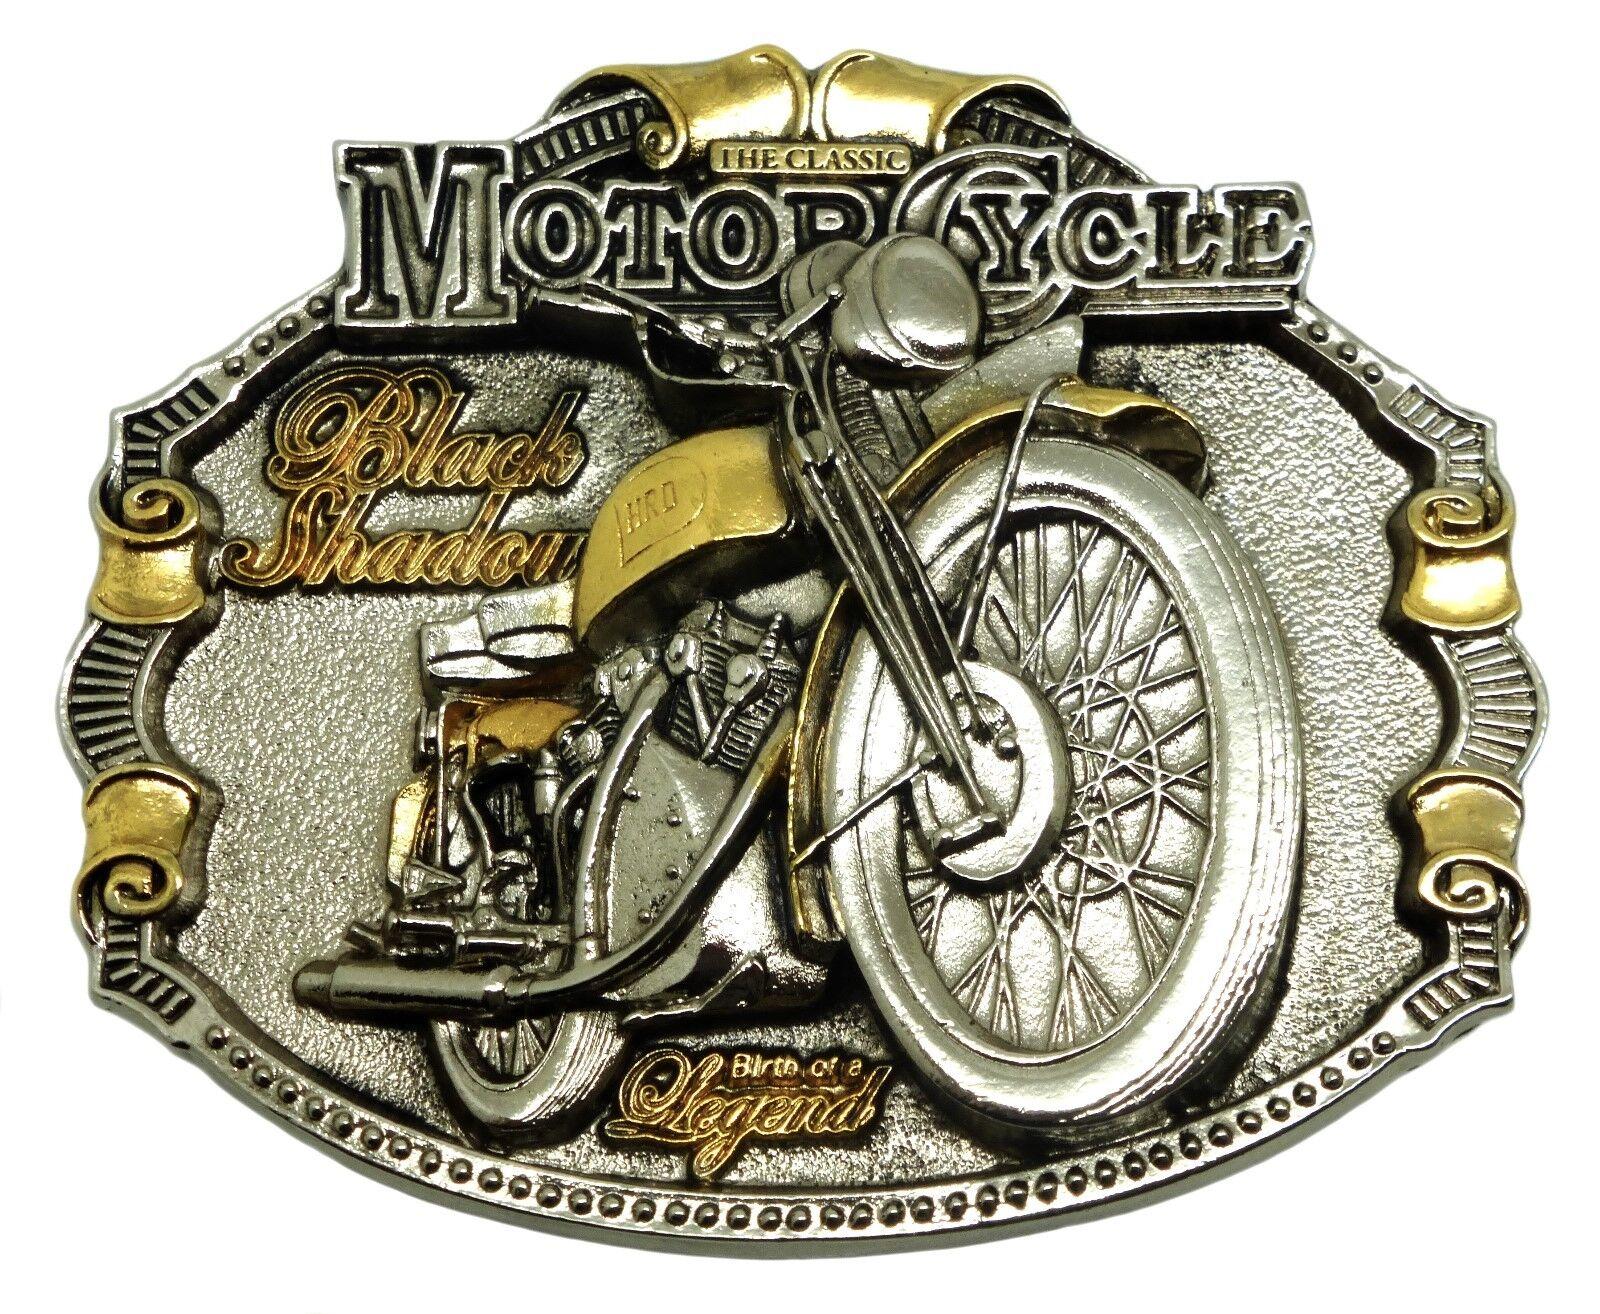 HRD Vincent Belt Buckle 24ct GOLD Biker Classic Motorcycle Authentic Licensed